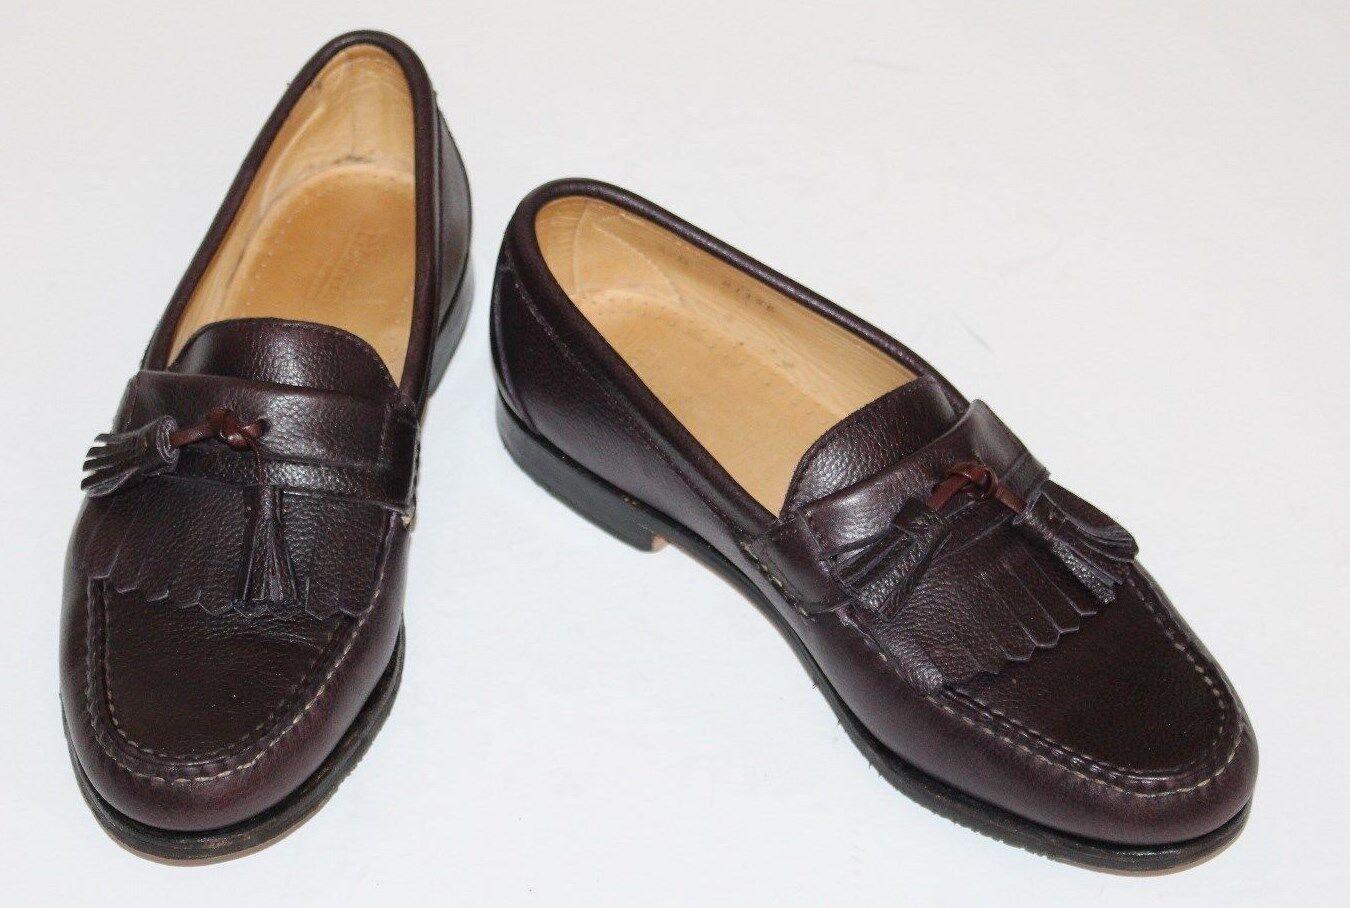 Allen Edmonds Danforth 8.5 D Cordovan Brown KiltieTassel Leather Loafer  US